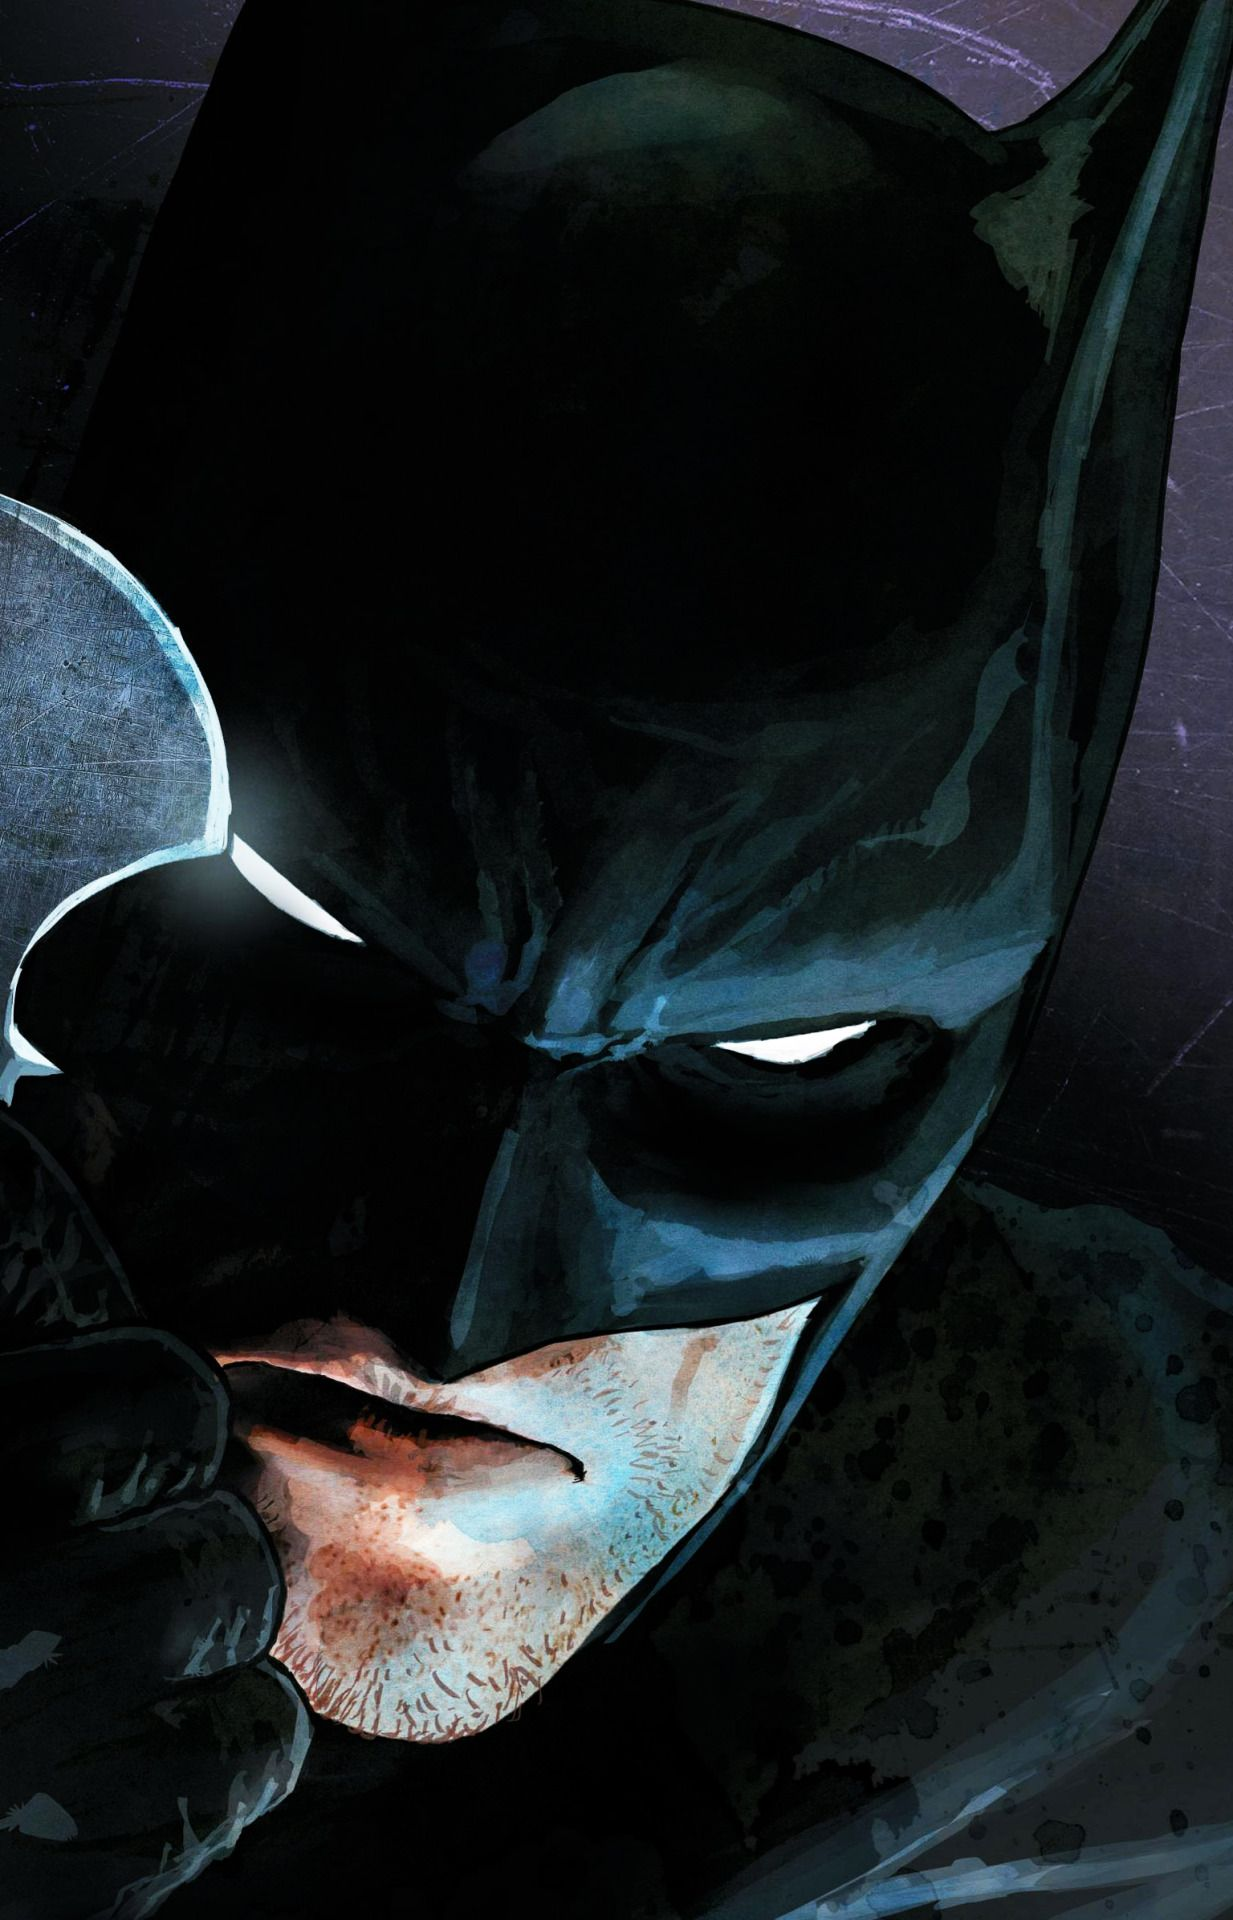 Black, batman, superhero, logo, abstract, apple, wallpaper